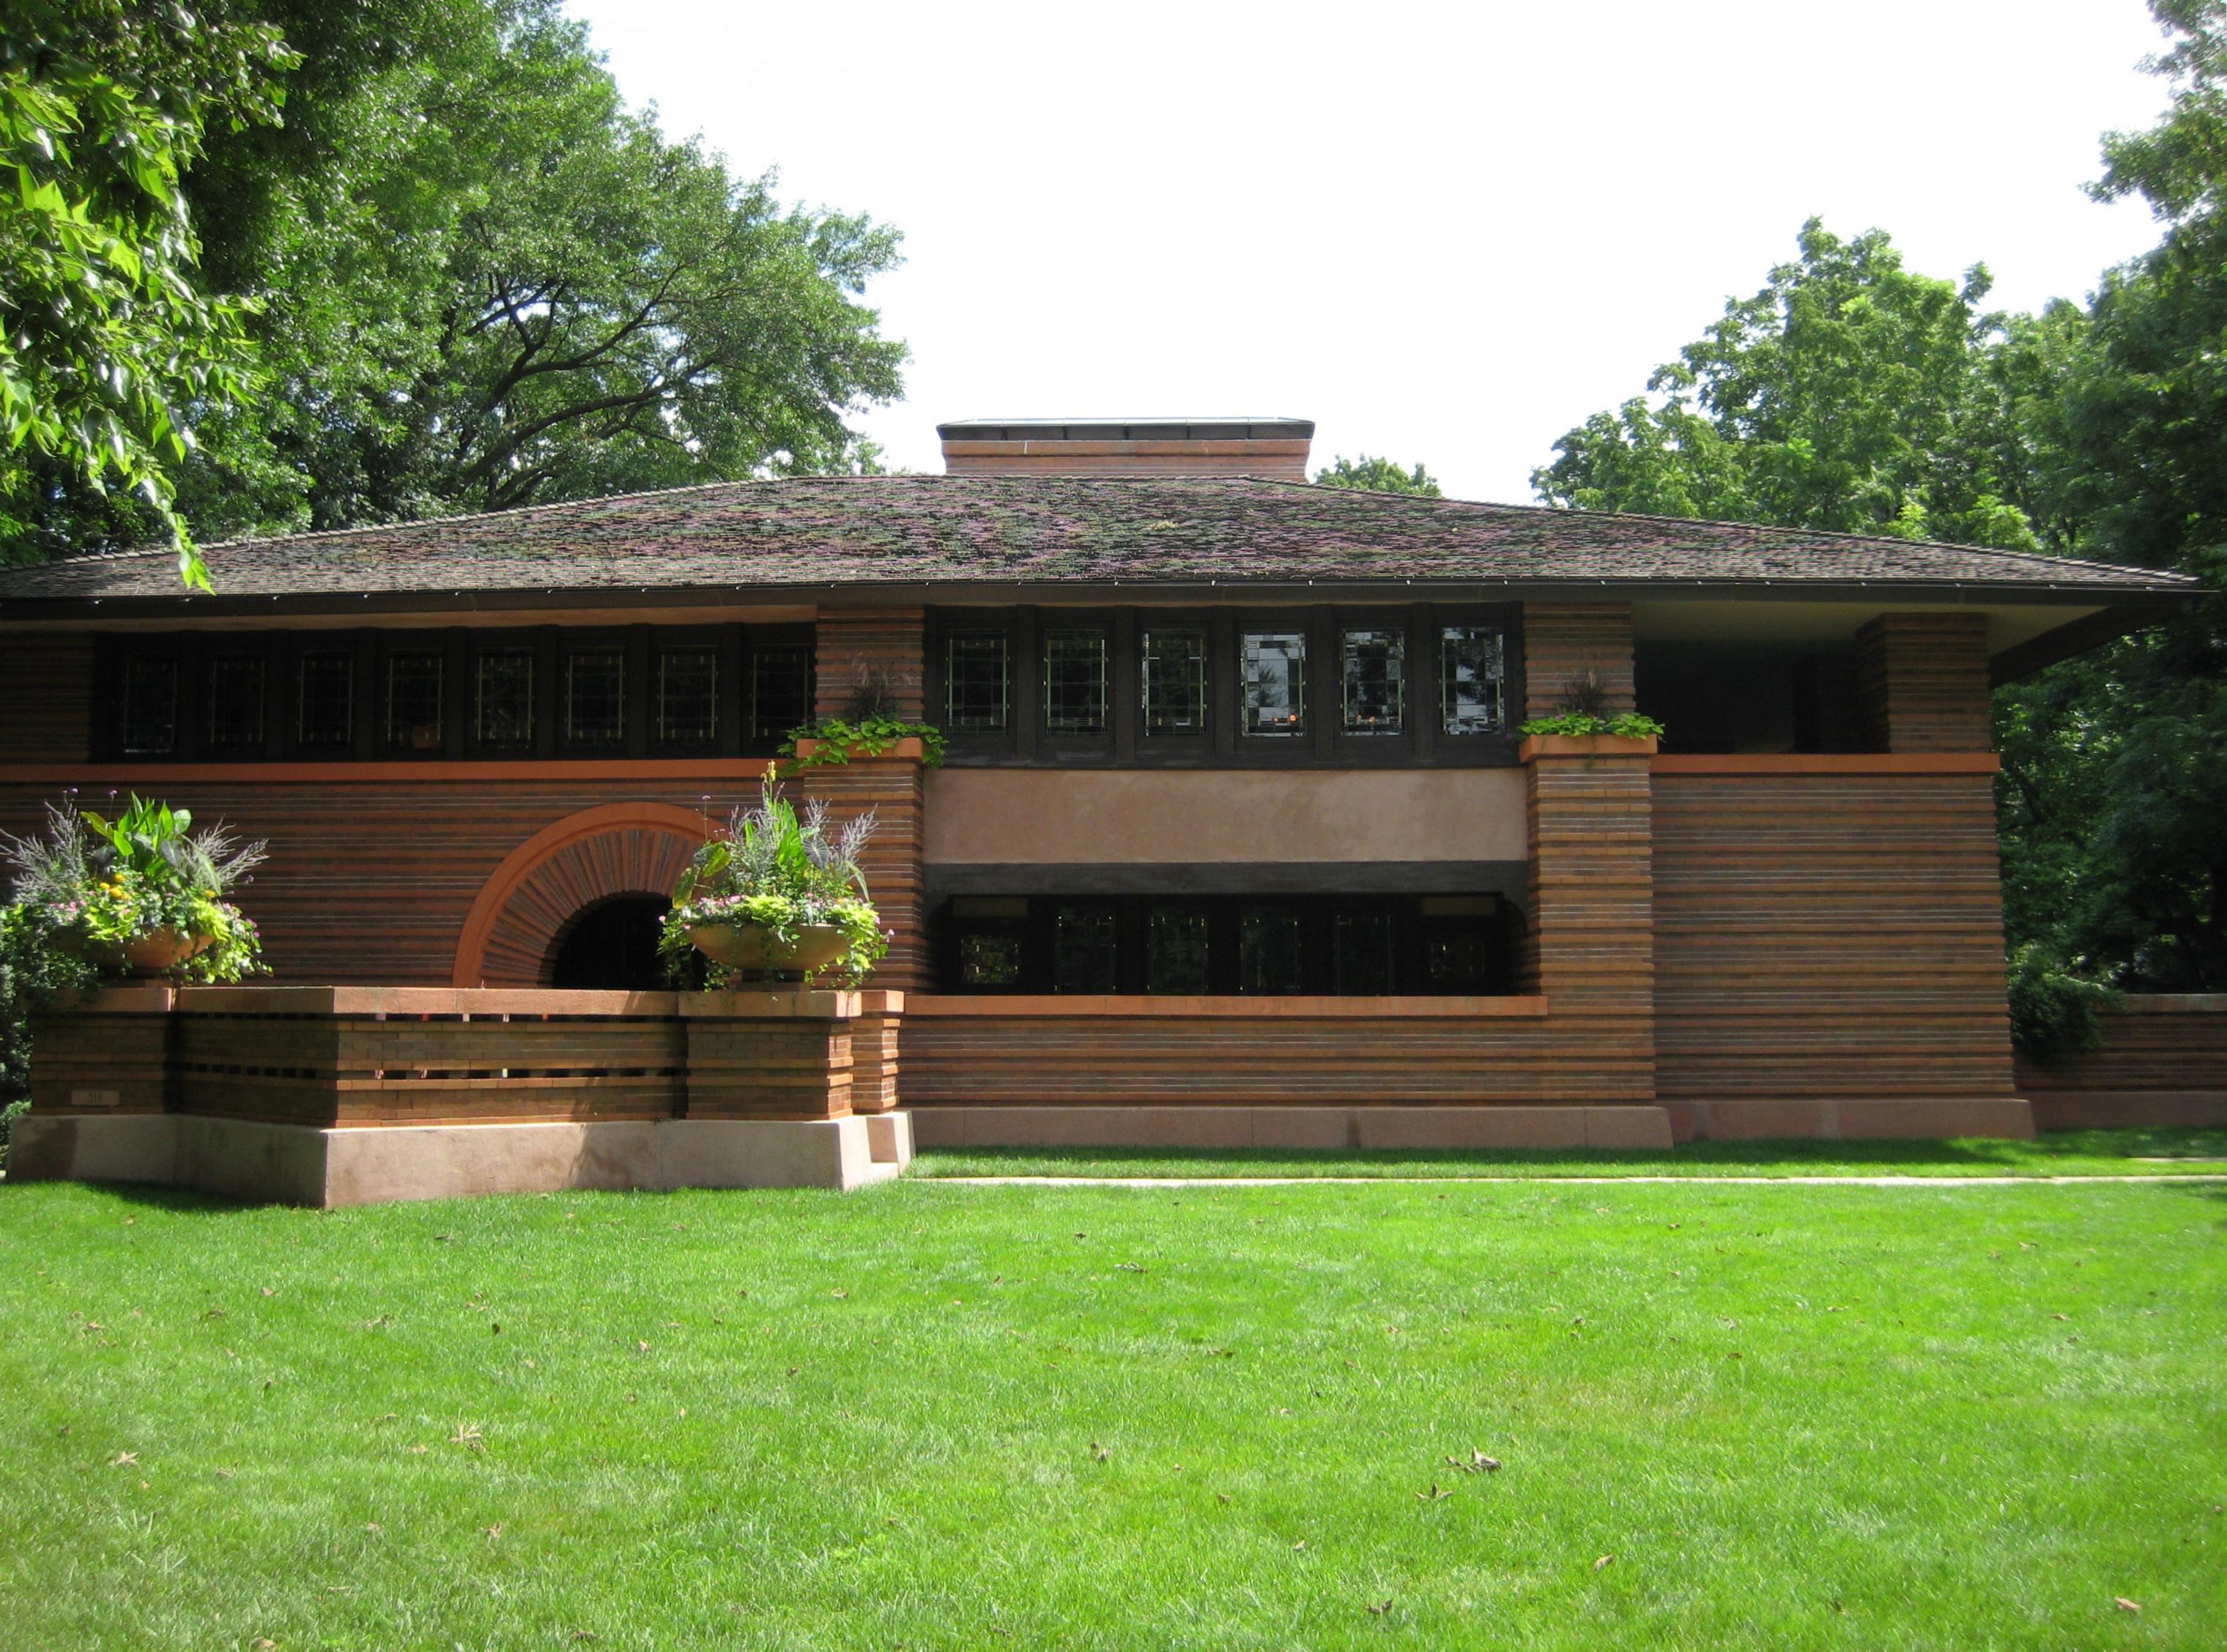 File:Prairie School Style Home.JPG - Wikimedia Commons